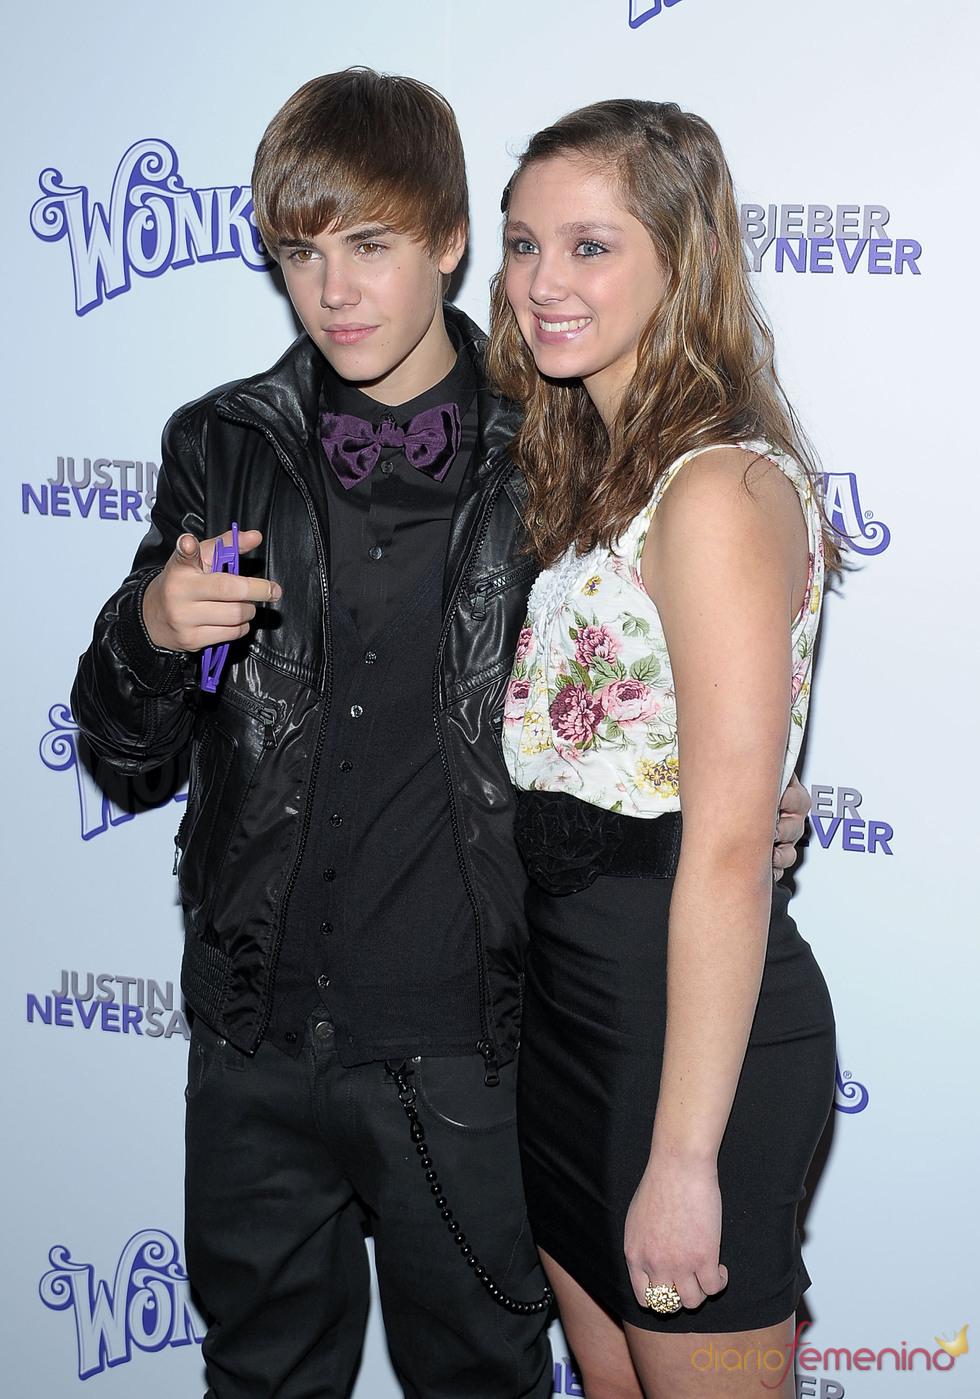 Justin Bieber con Lynsey Mickolas en la presentación de 'Never say never'